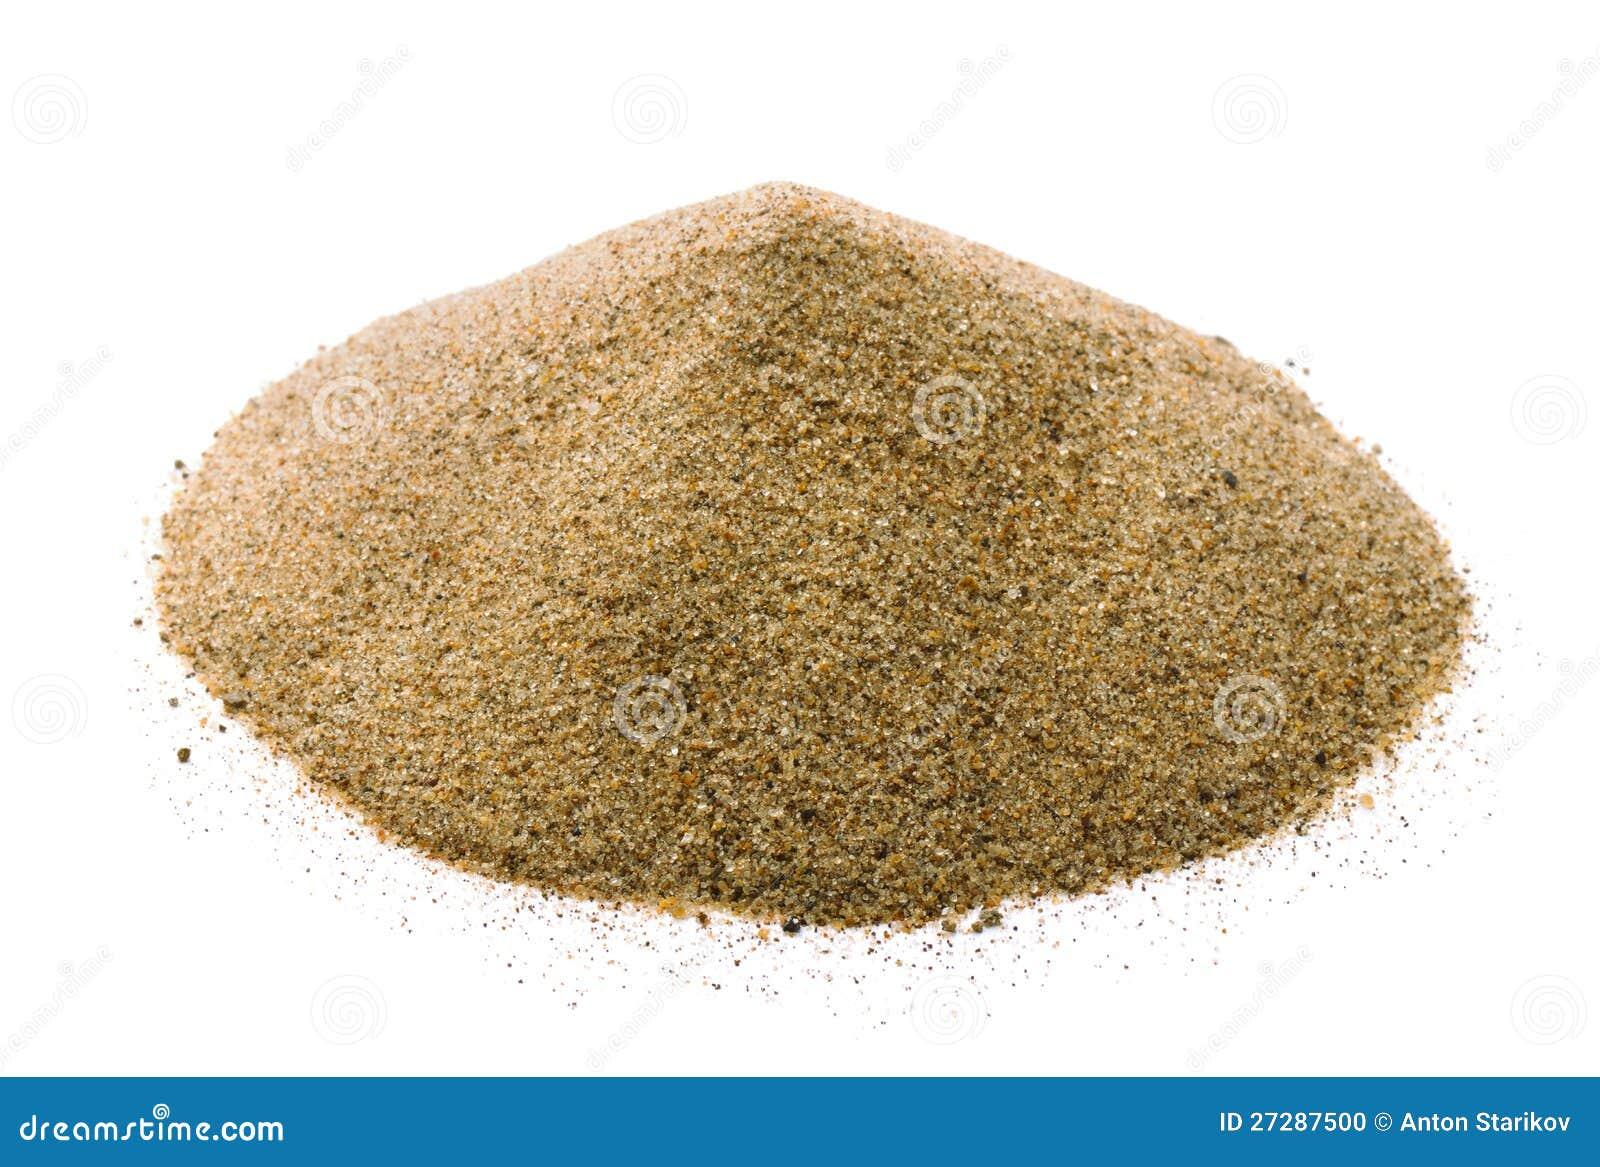 Sand Stock Photo - Image: 27287500